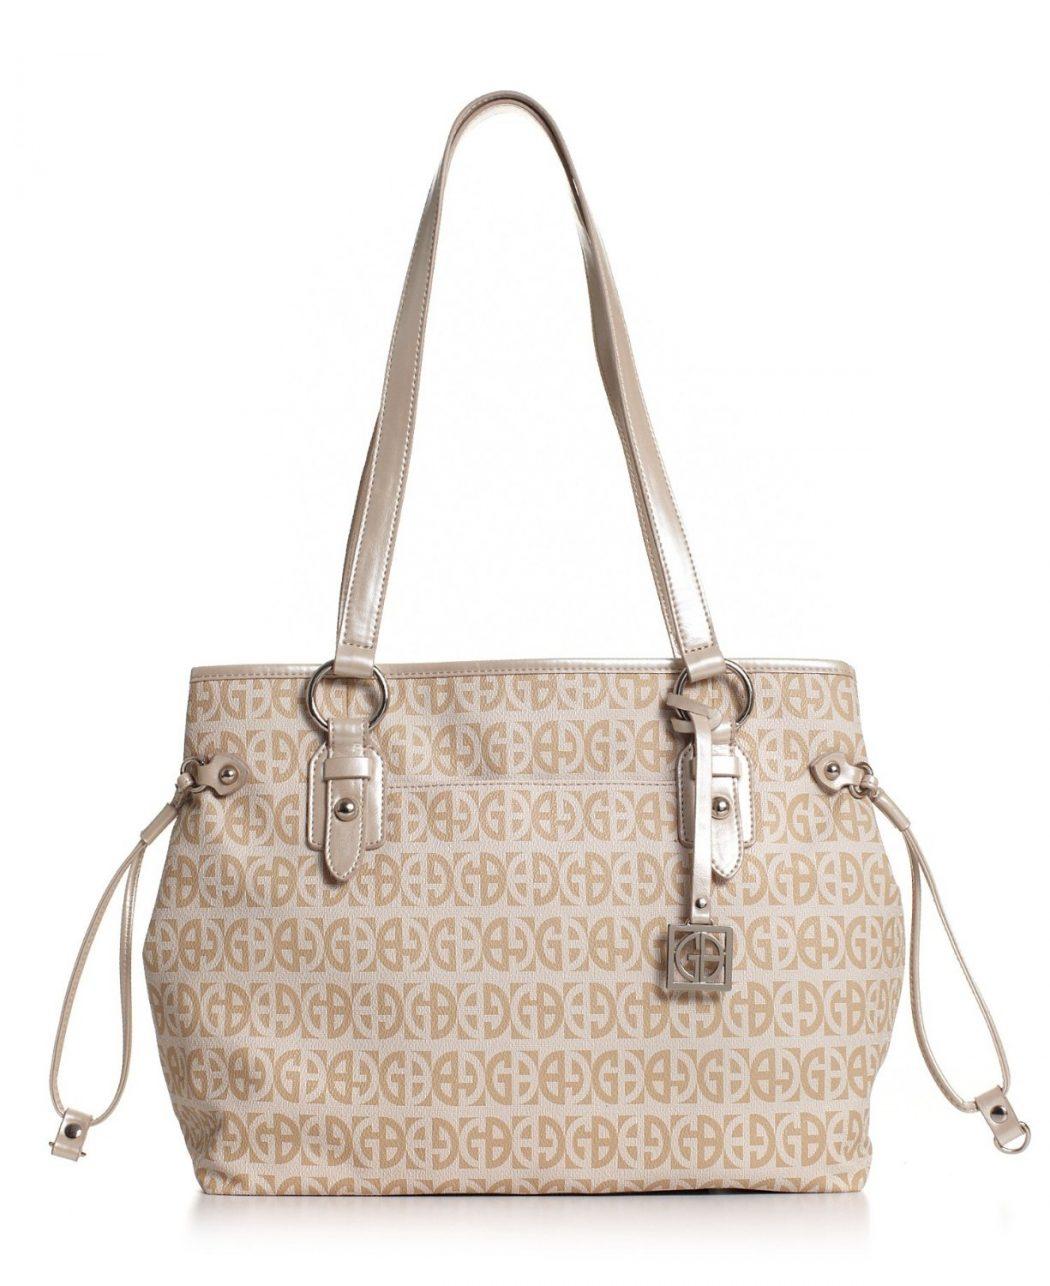 Giani-Bernini-Handbags-2013-Fashionable-Handbags-Trend-3 The Next 7 Women's Bag Fashion Trends of This Year!